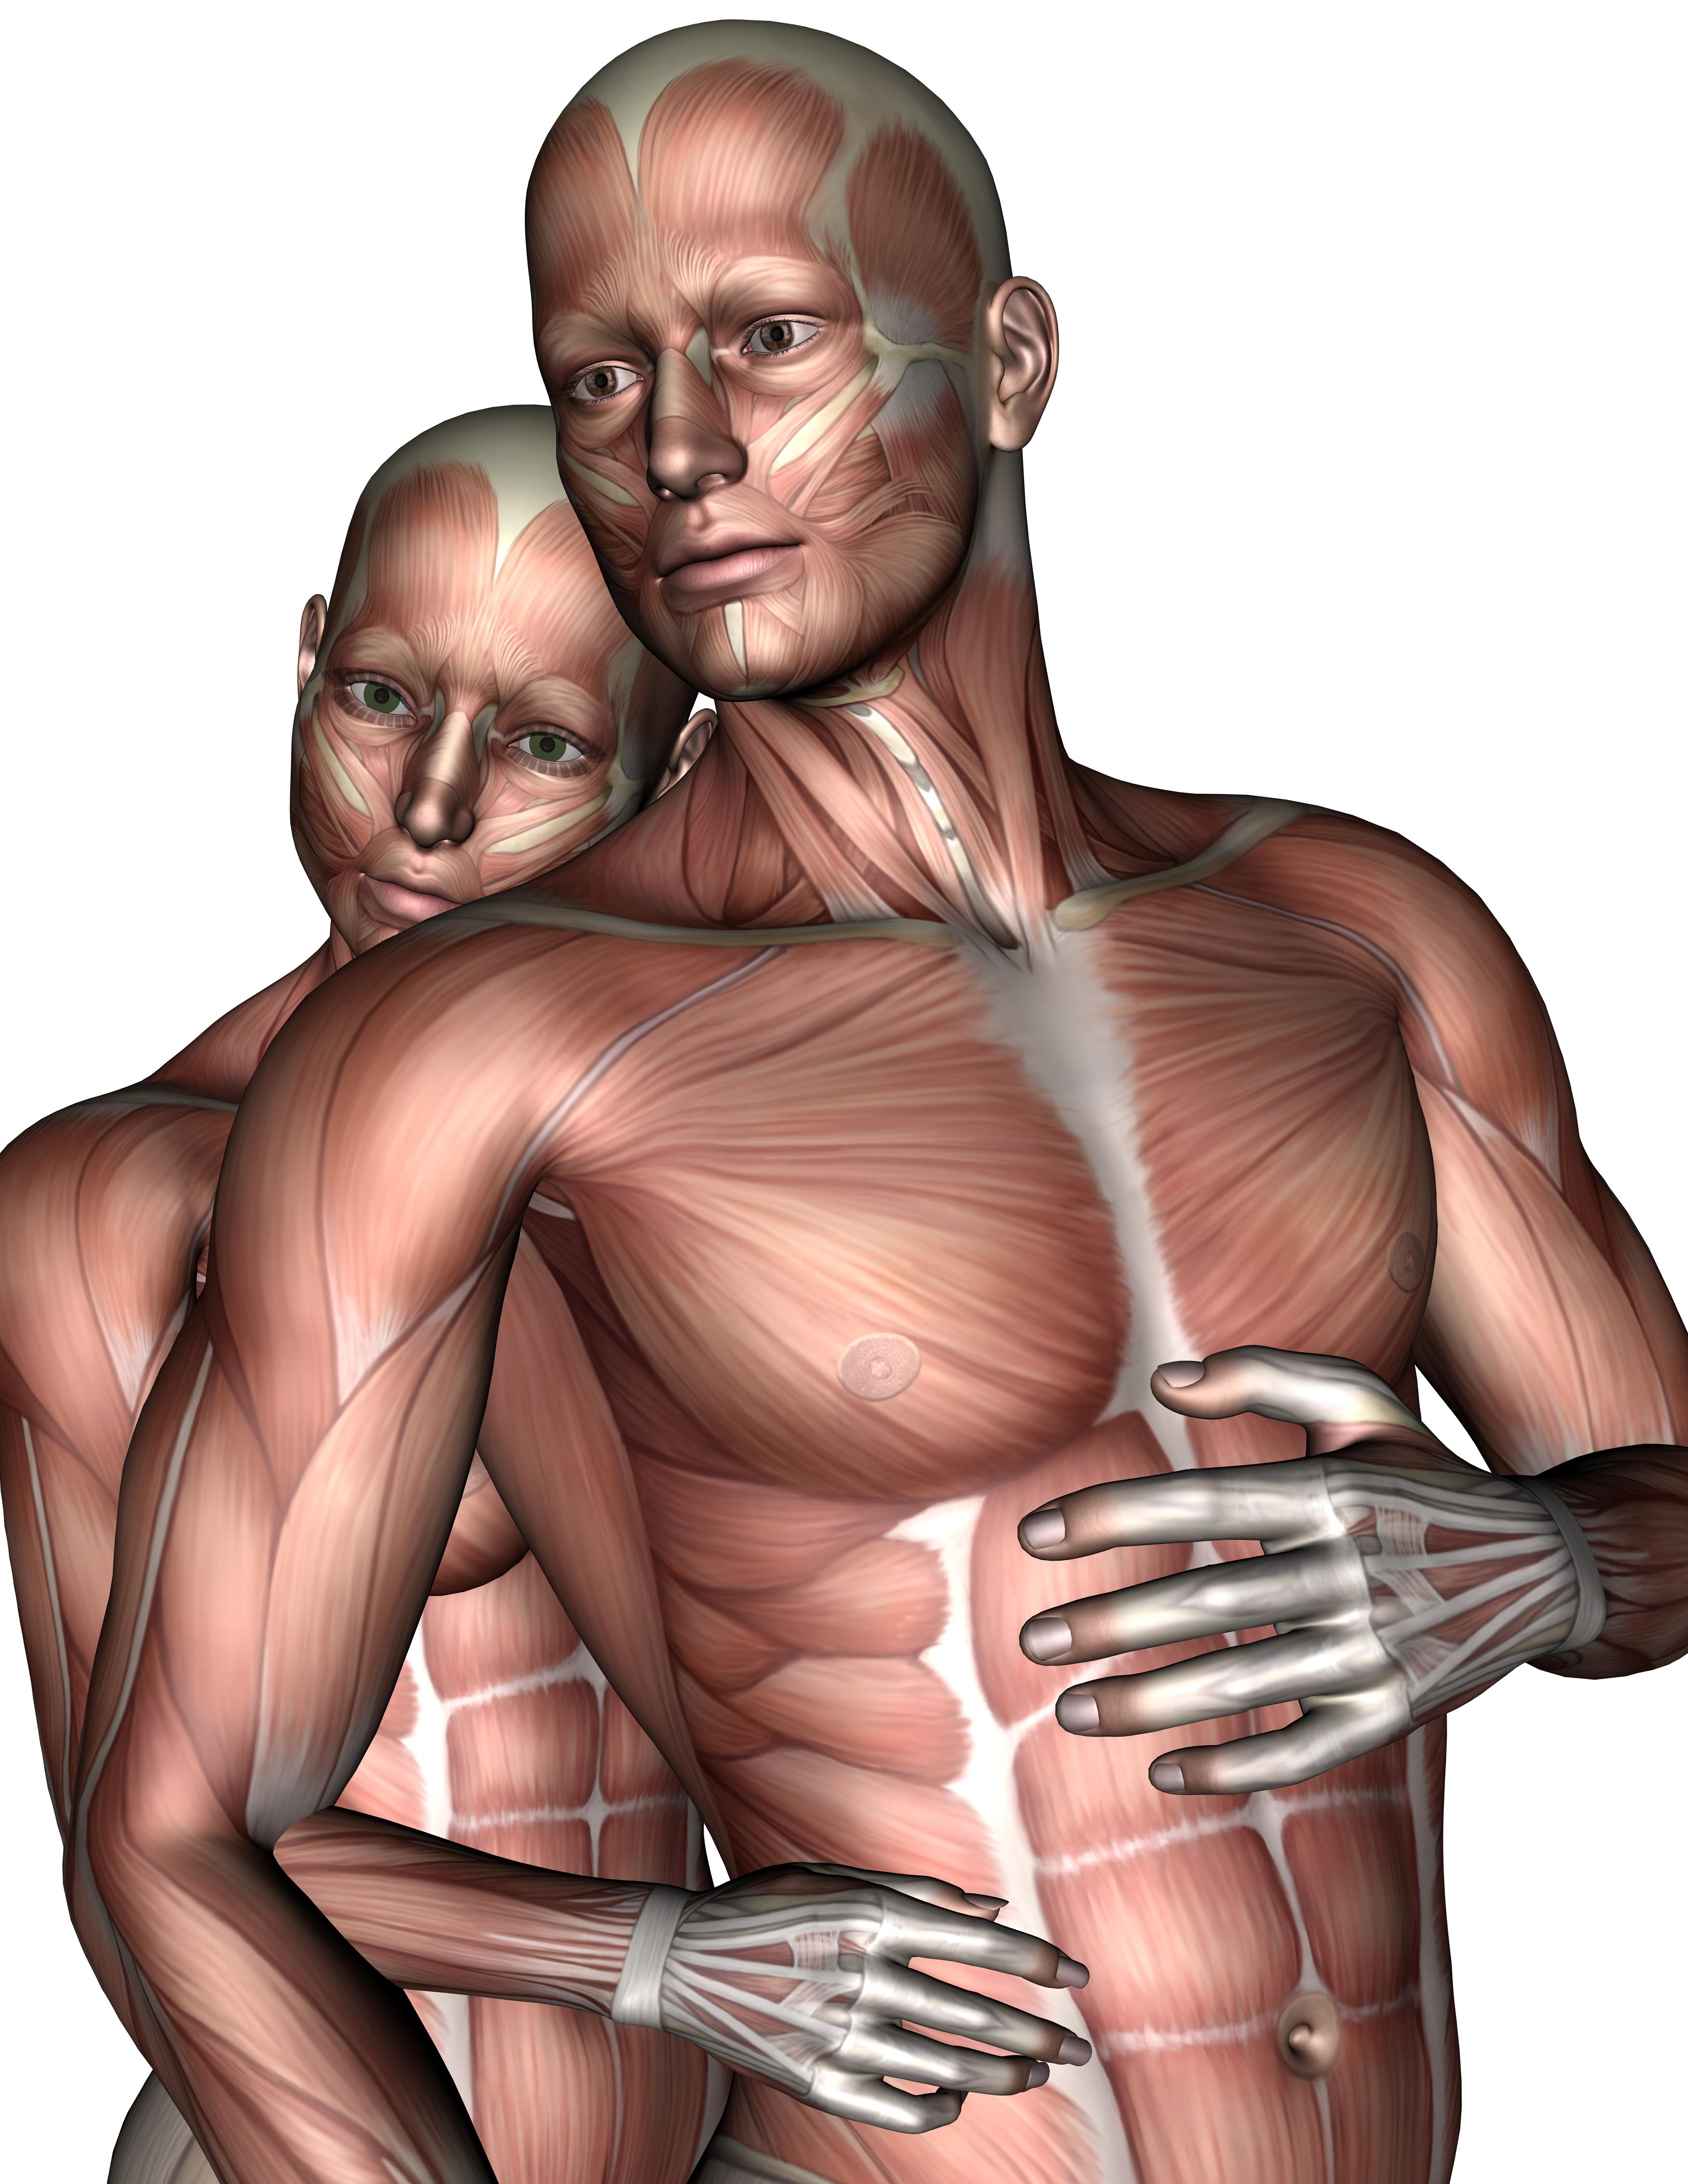 Lovers 3, 3d, Anatomy, Female, Love, HQ Photo